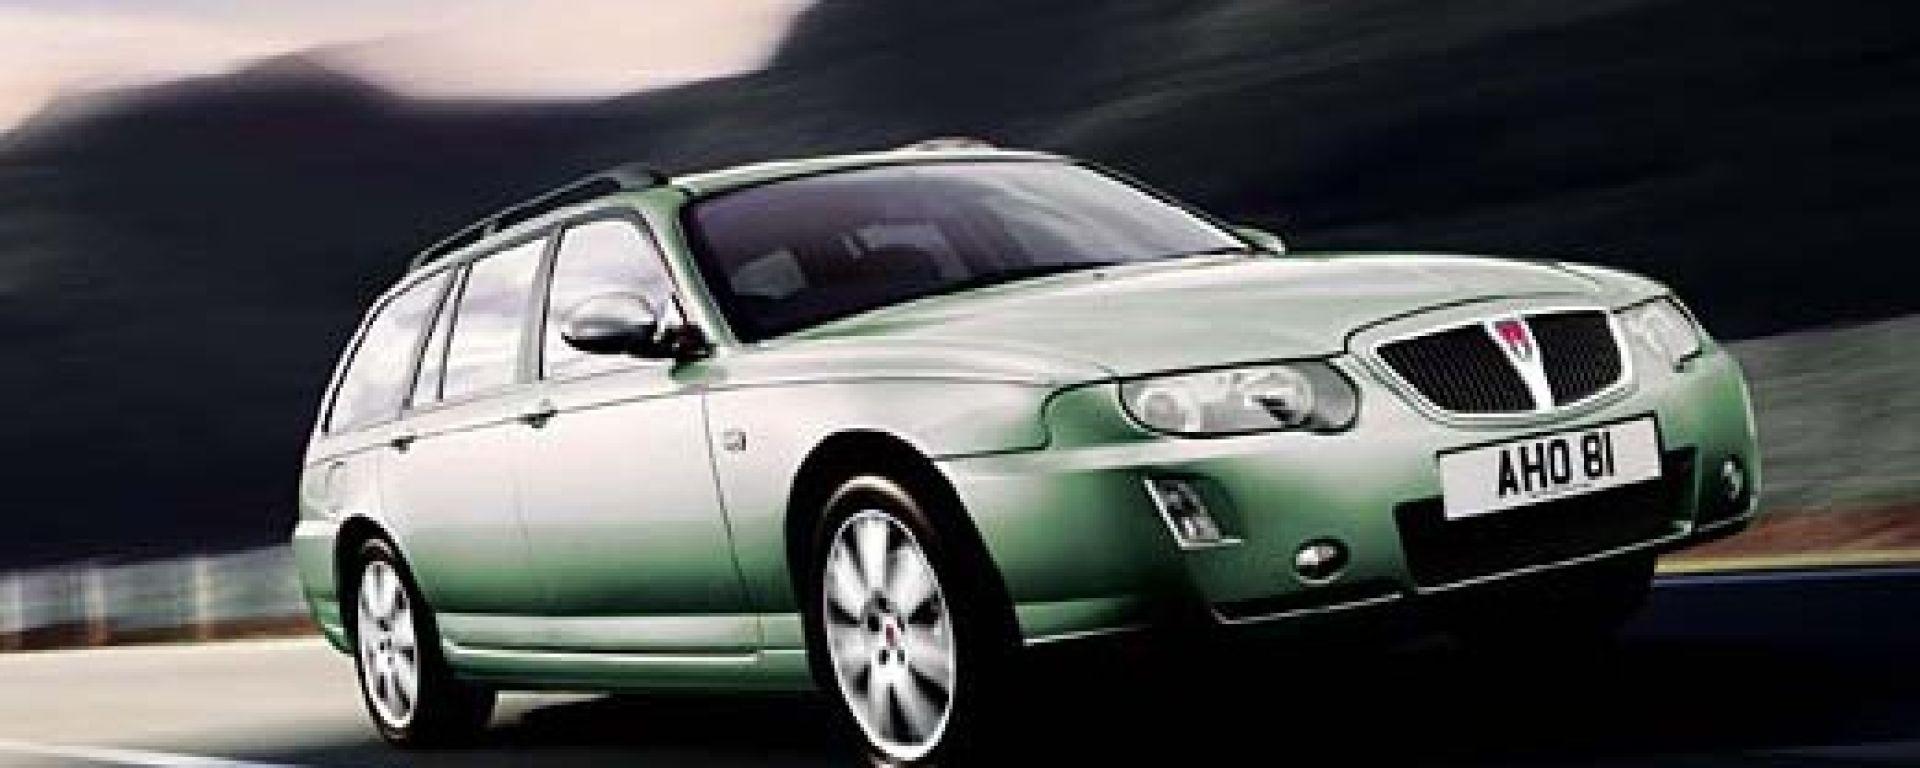 Anteprima: Rover 75 2004